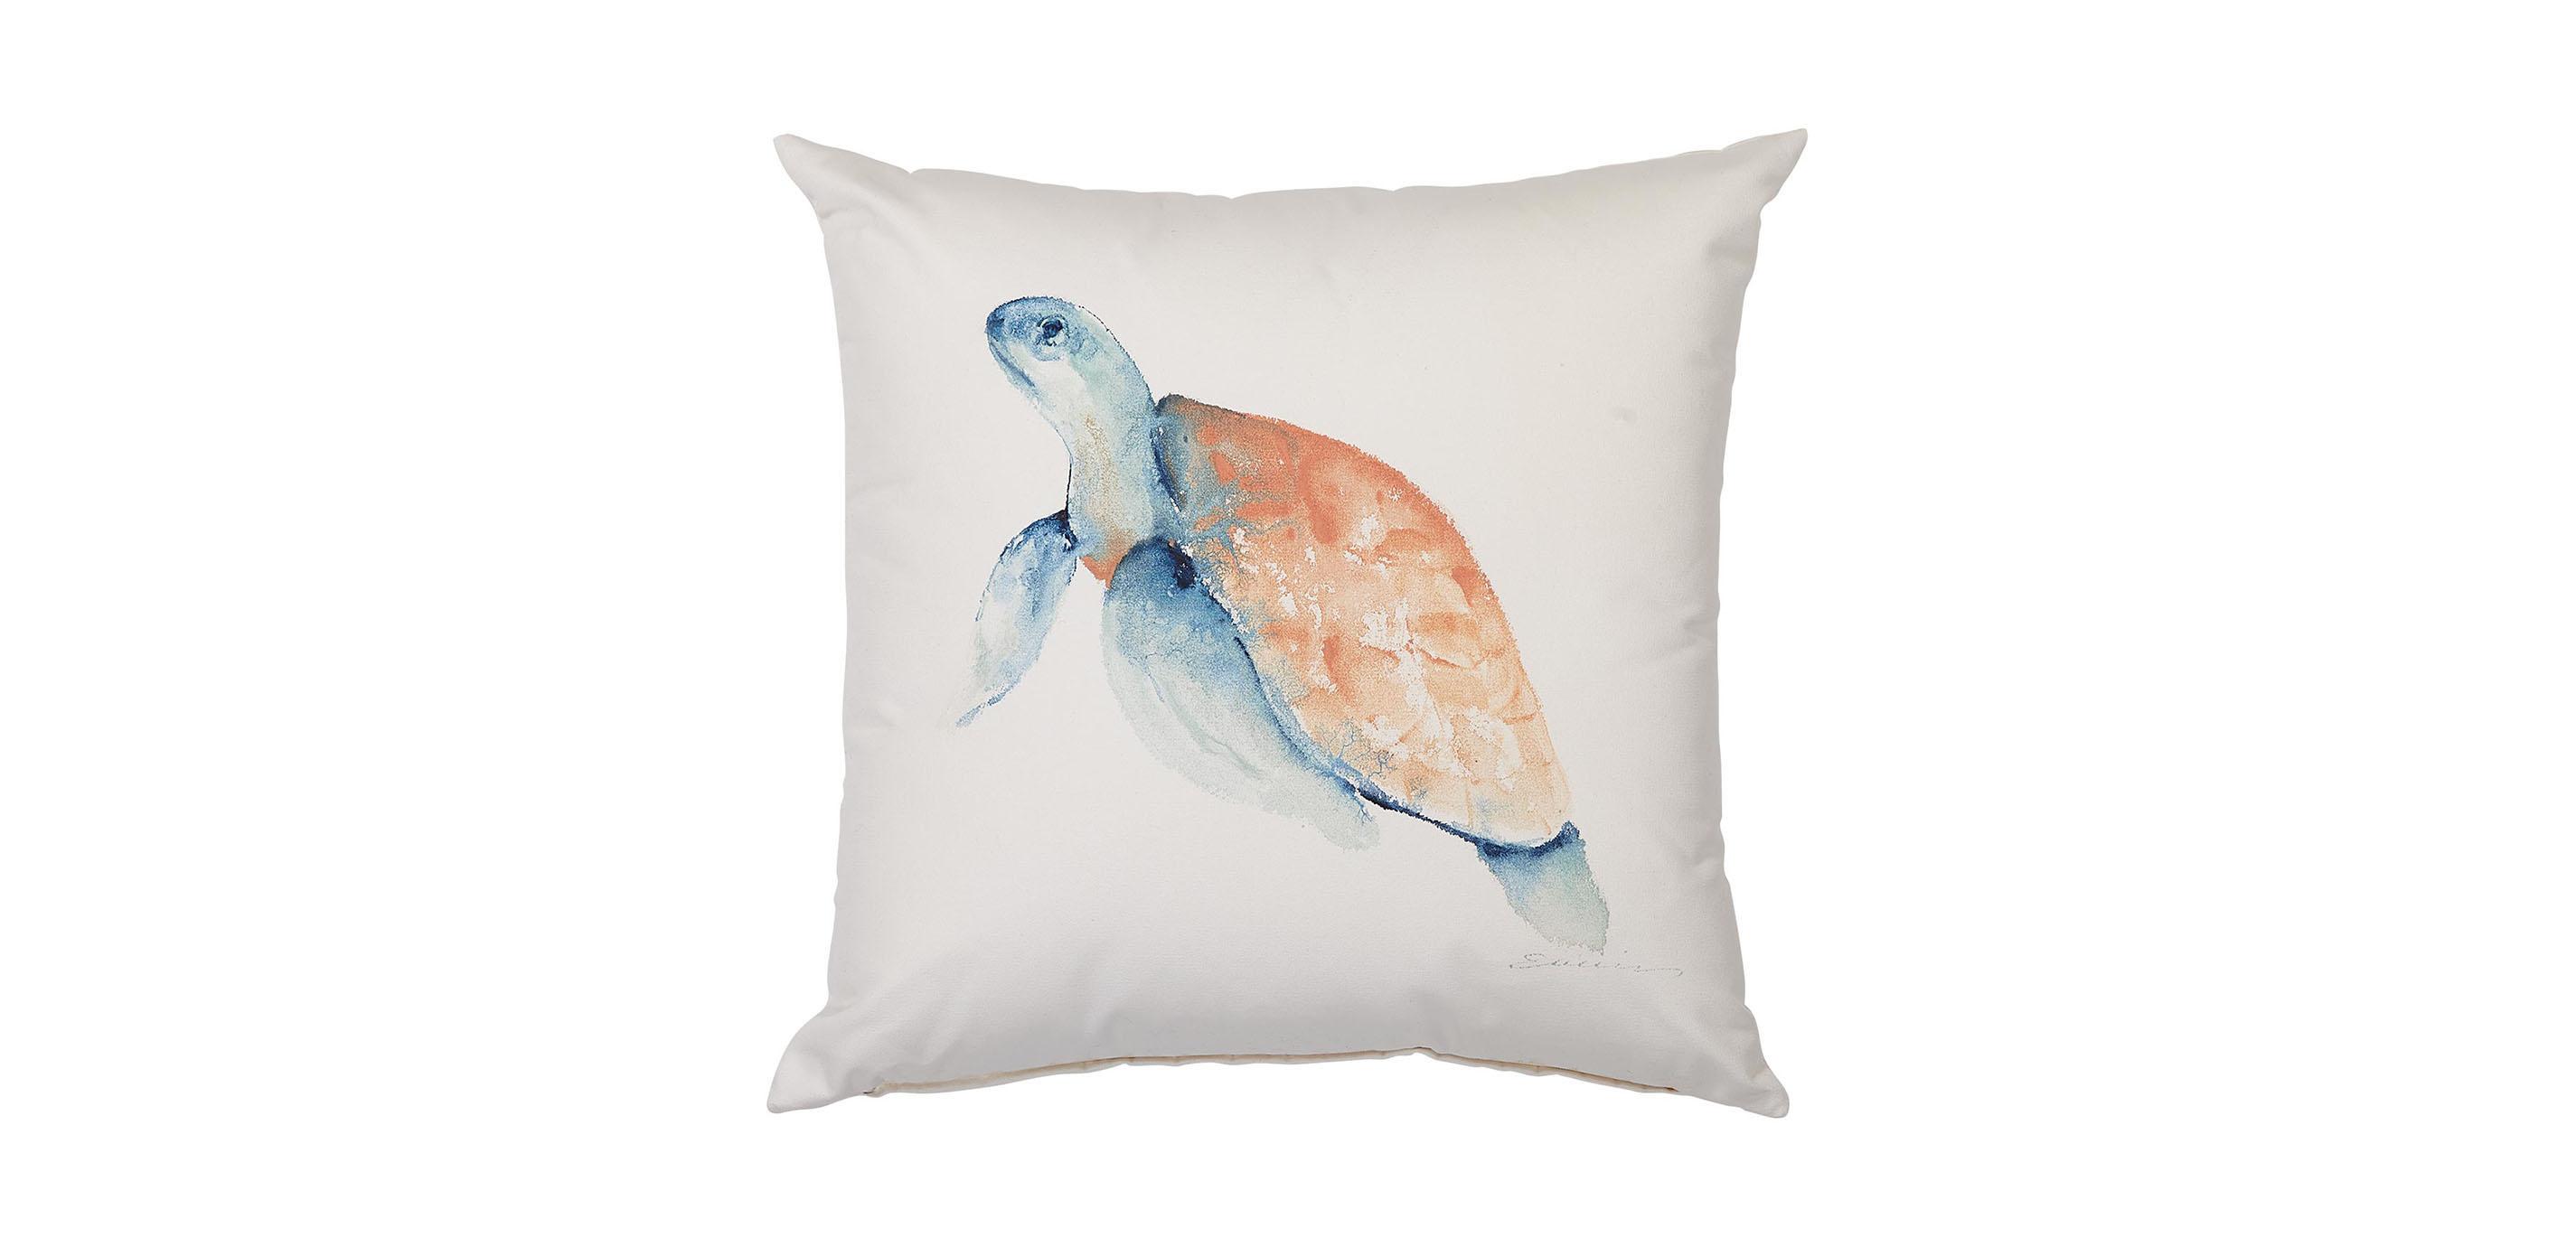 Sea Turtle Pillow Sea Turtle Outdoor Throw Pillow Ethan Allen